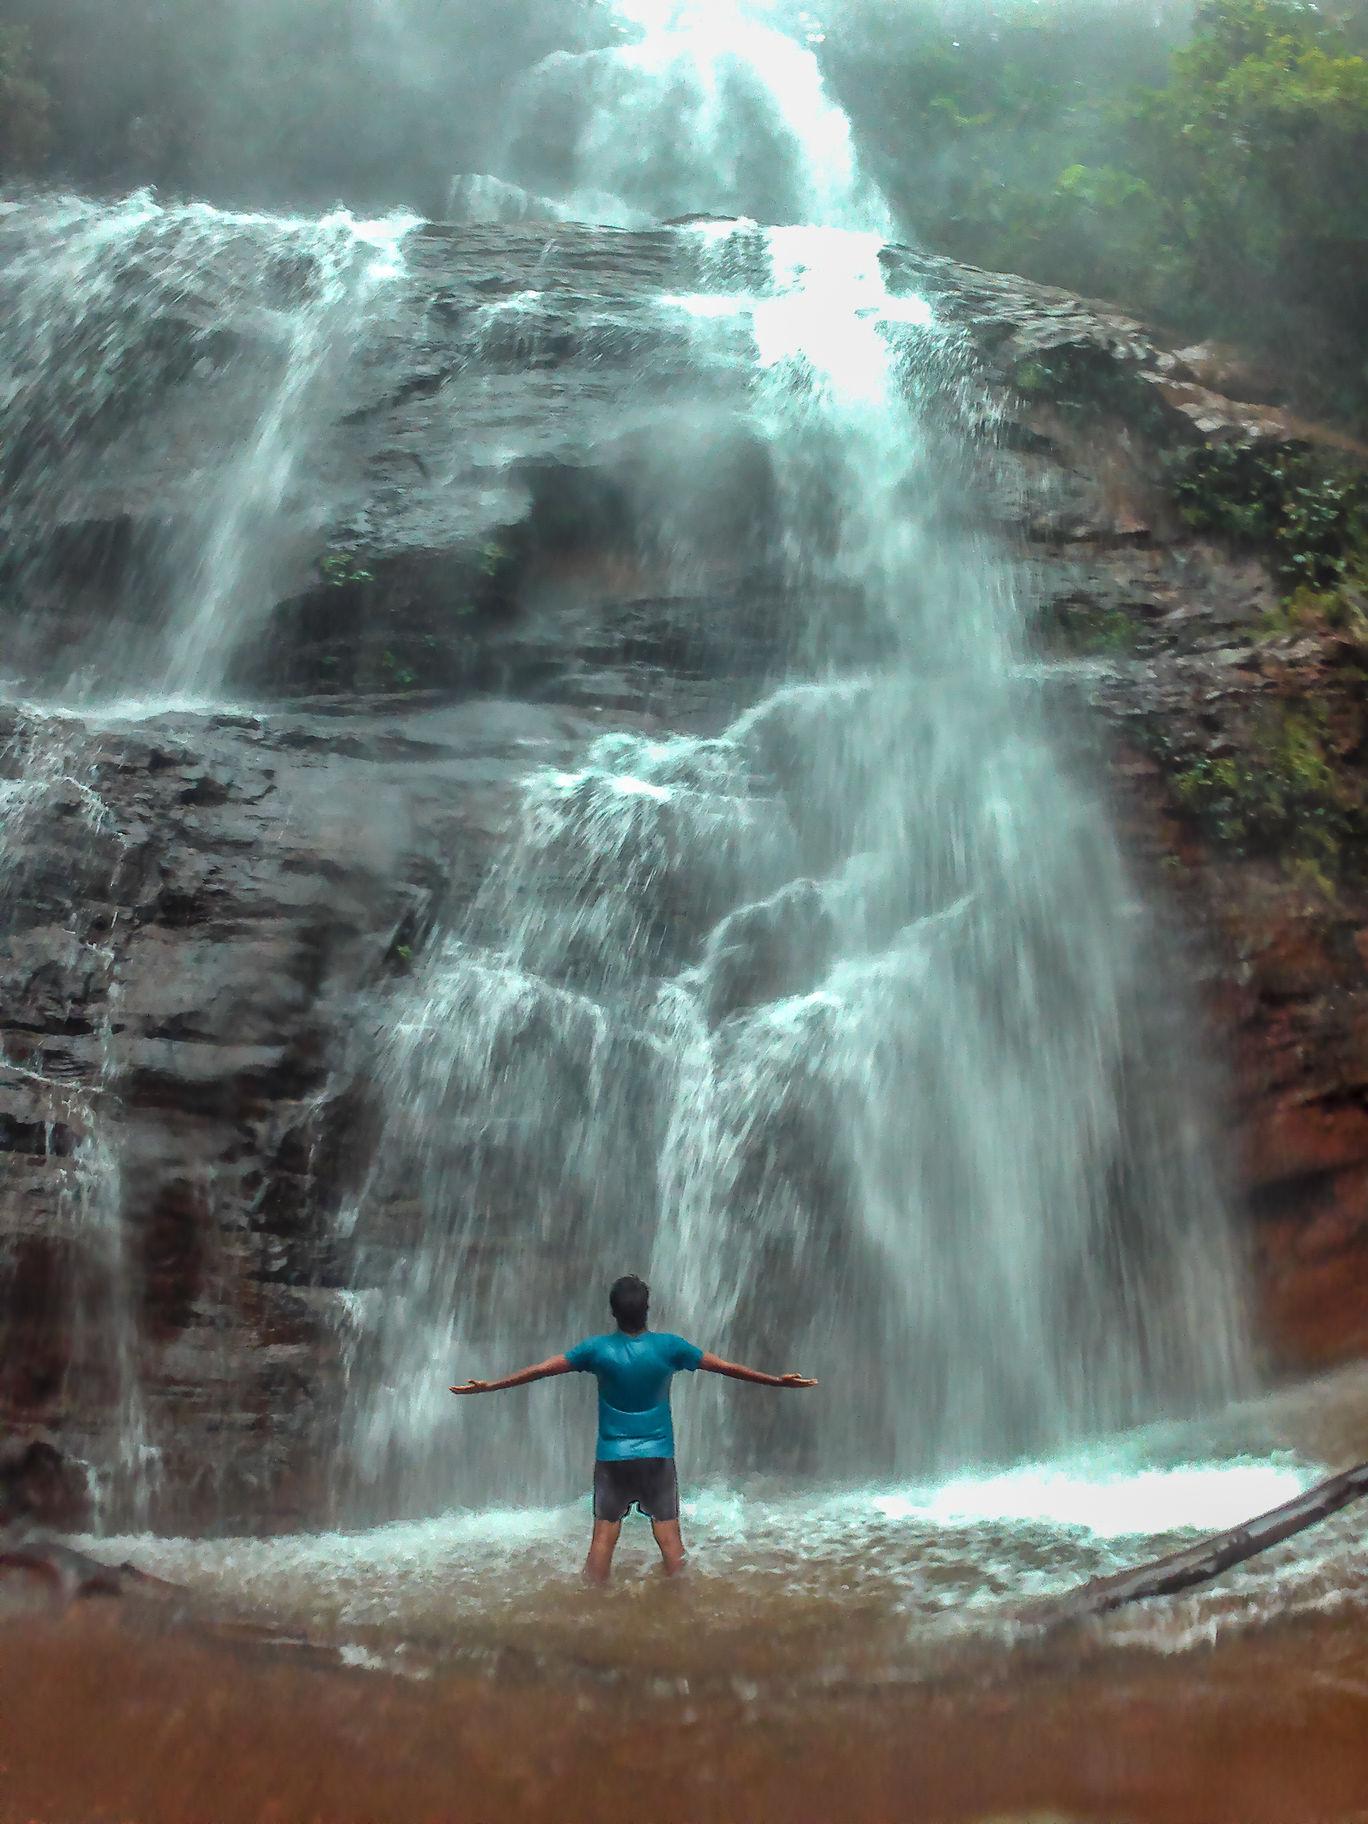 Photo of Jhari water falls path By Raghav Raghul